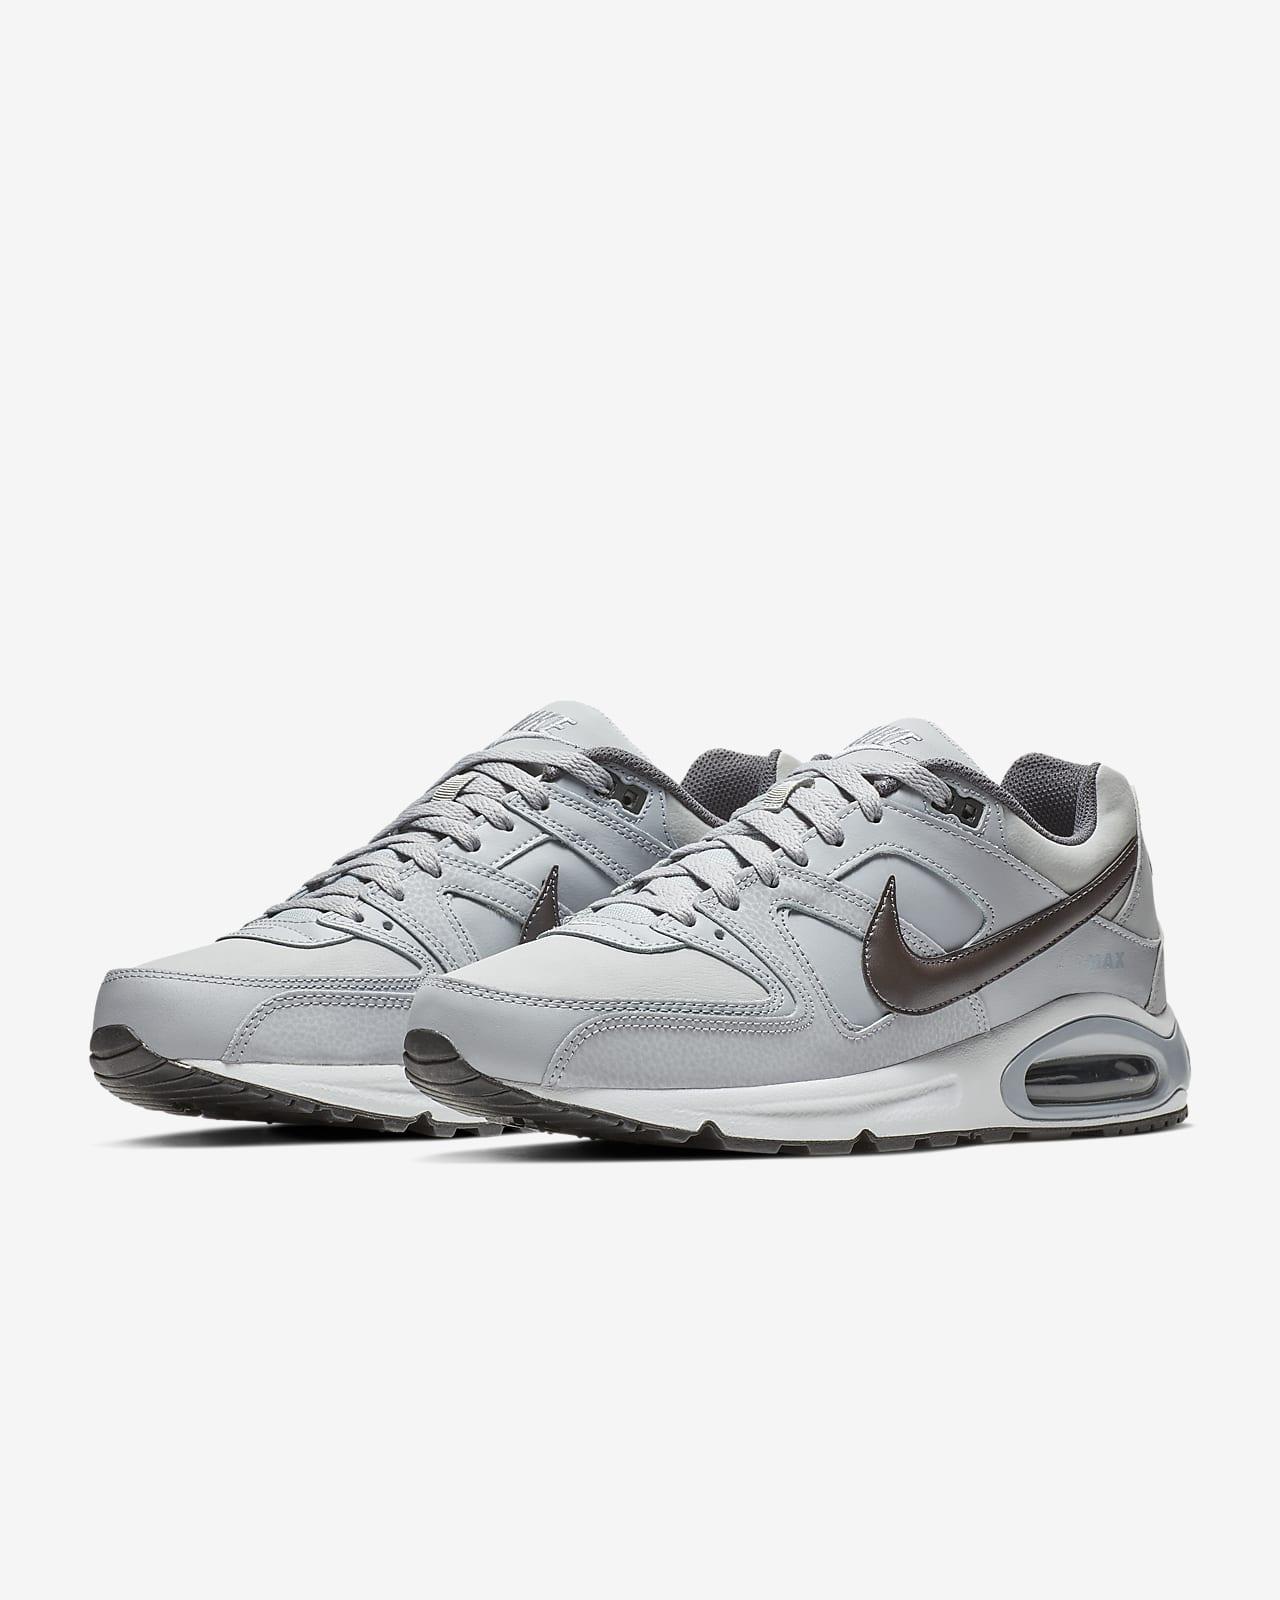 Nike Air Max Command Men's Shoe. Nike LU